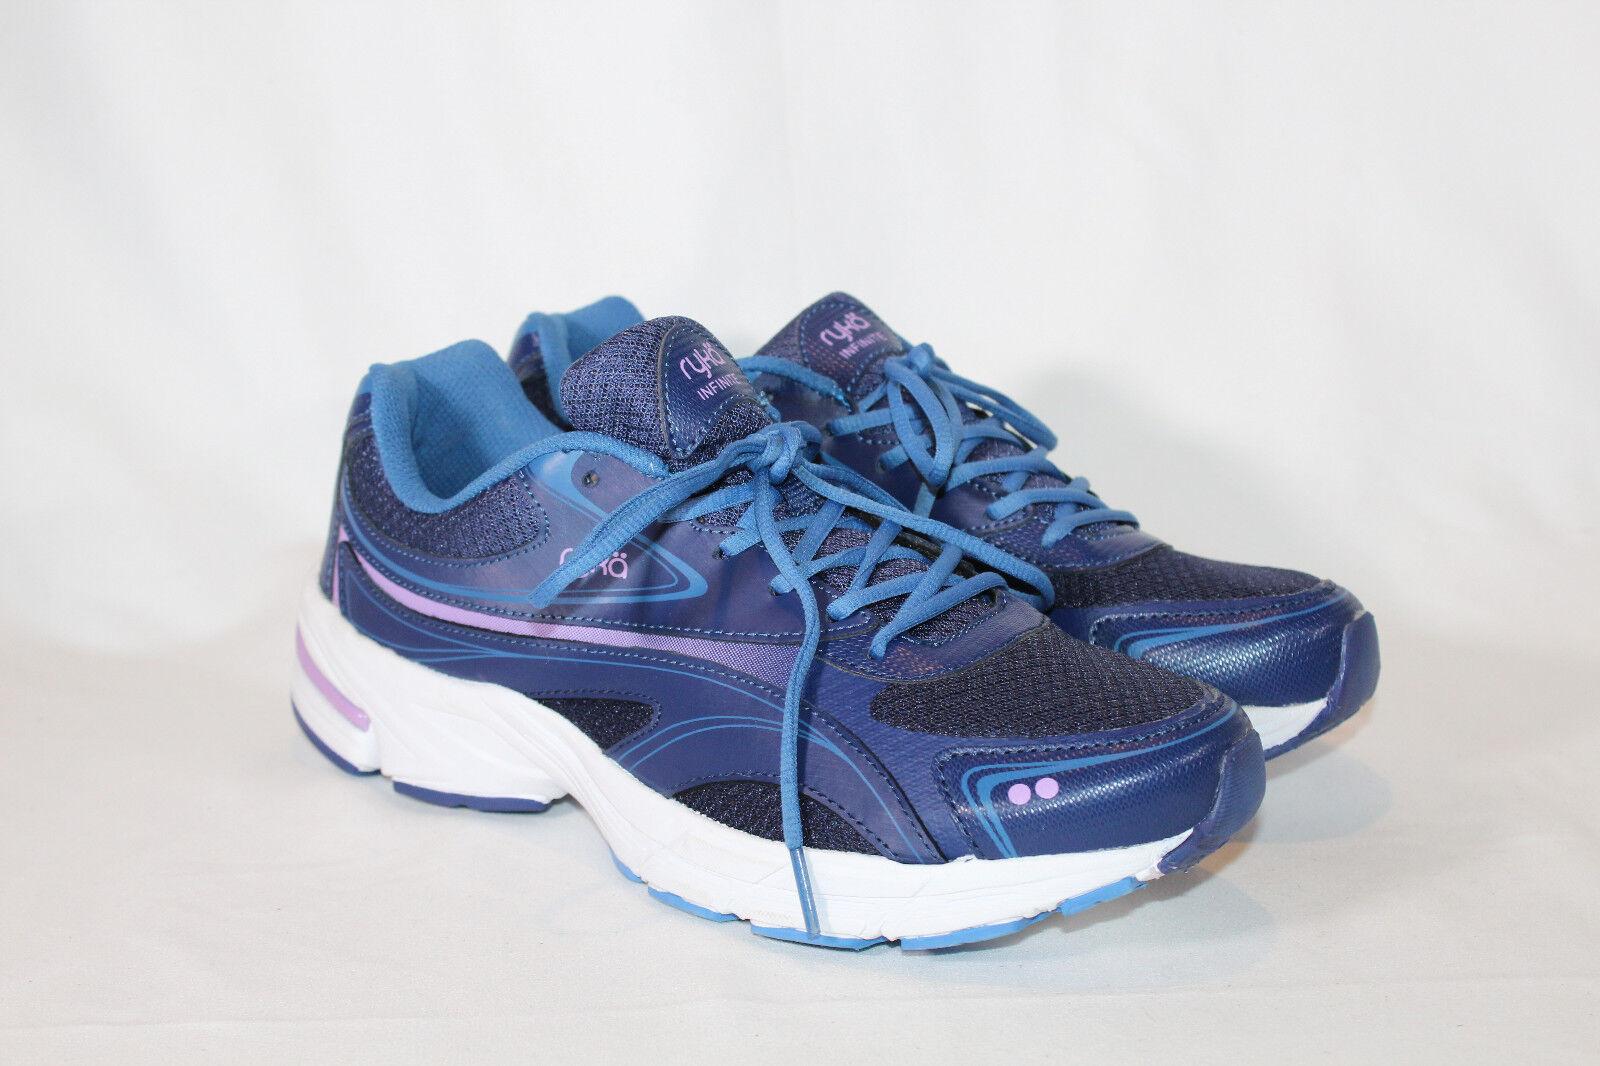 Ryka Mesh Leather Lace-up Walking Sneakers  Infinite 2 11 medium bluee